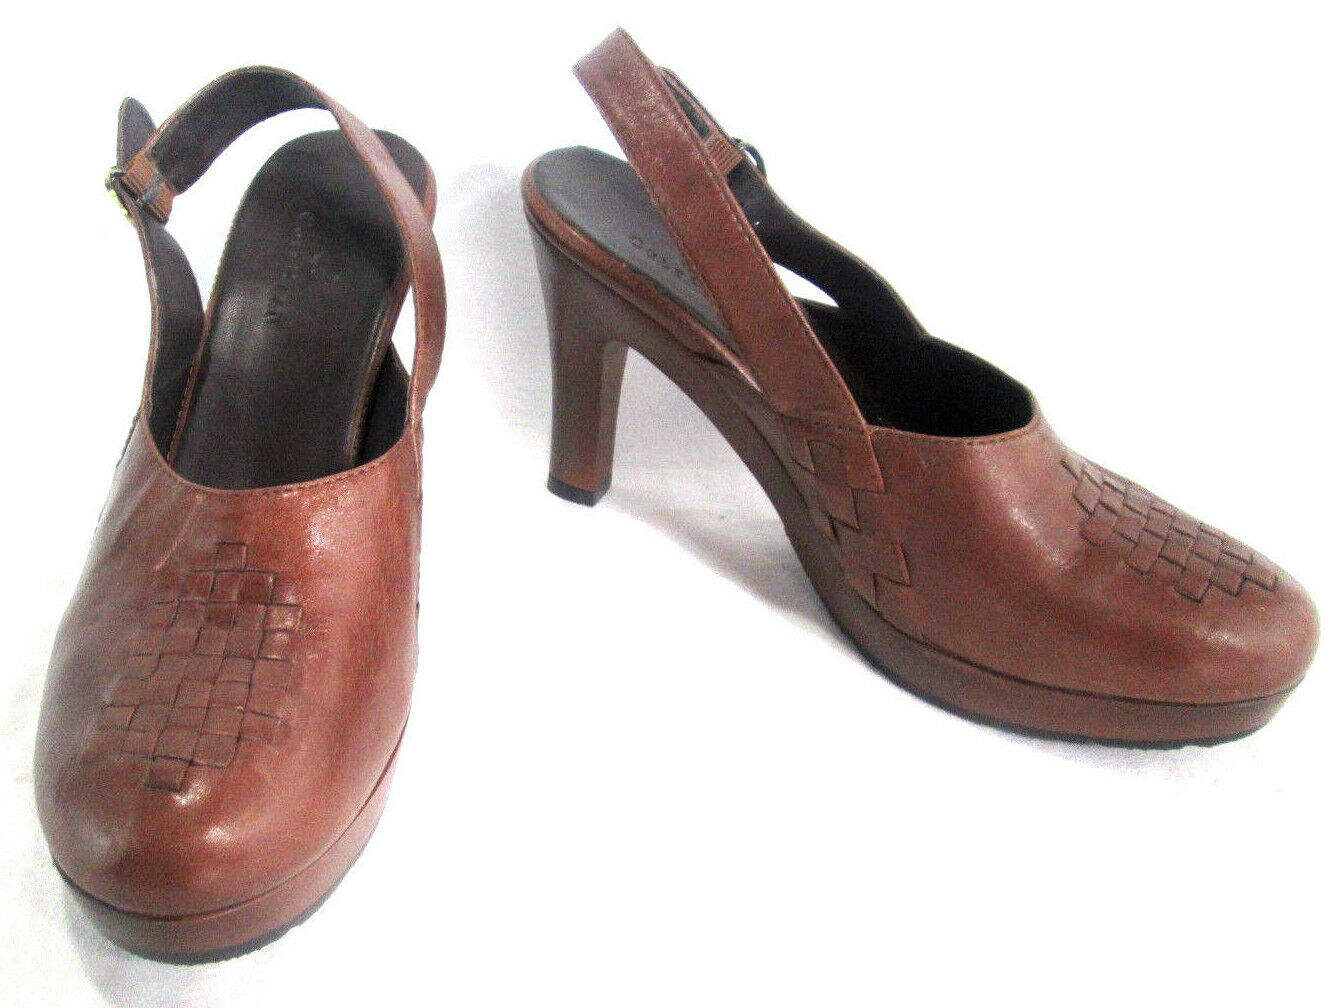 Cole Haan Women's shoes Heels Mule Brown Leather Weave Wood Sole 4 heel Size 9 B